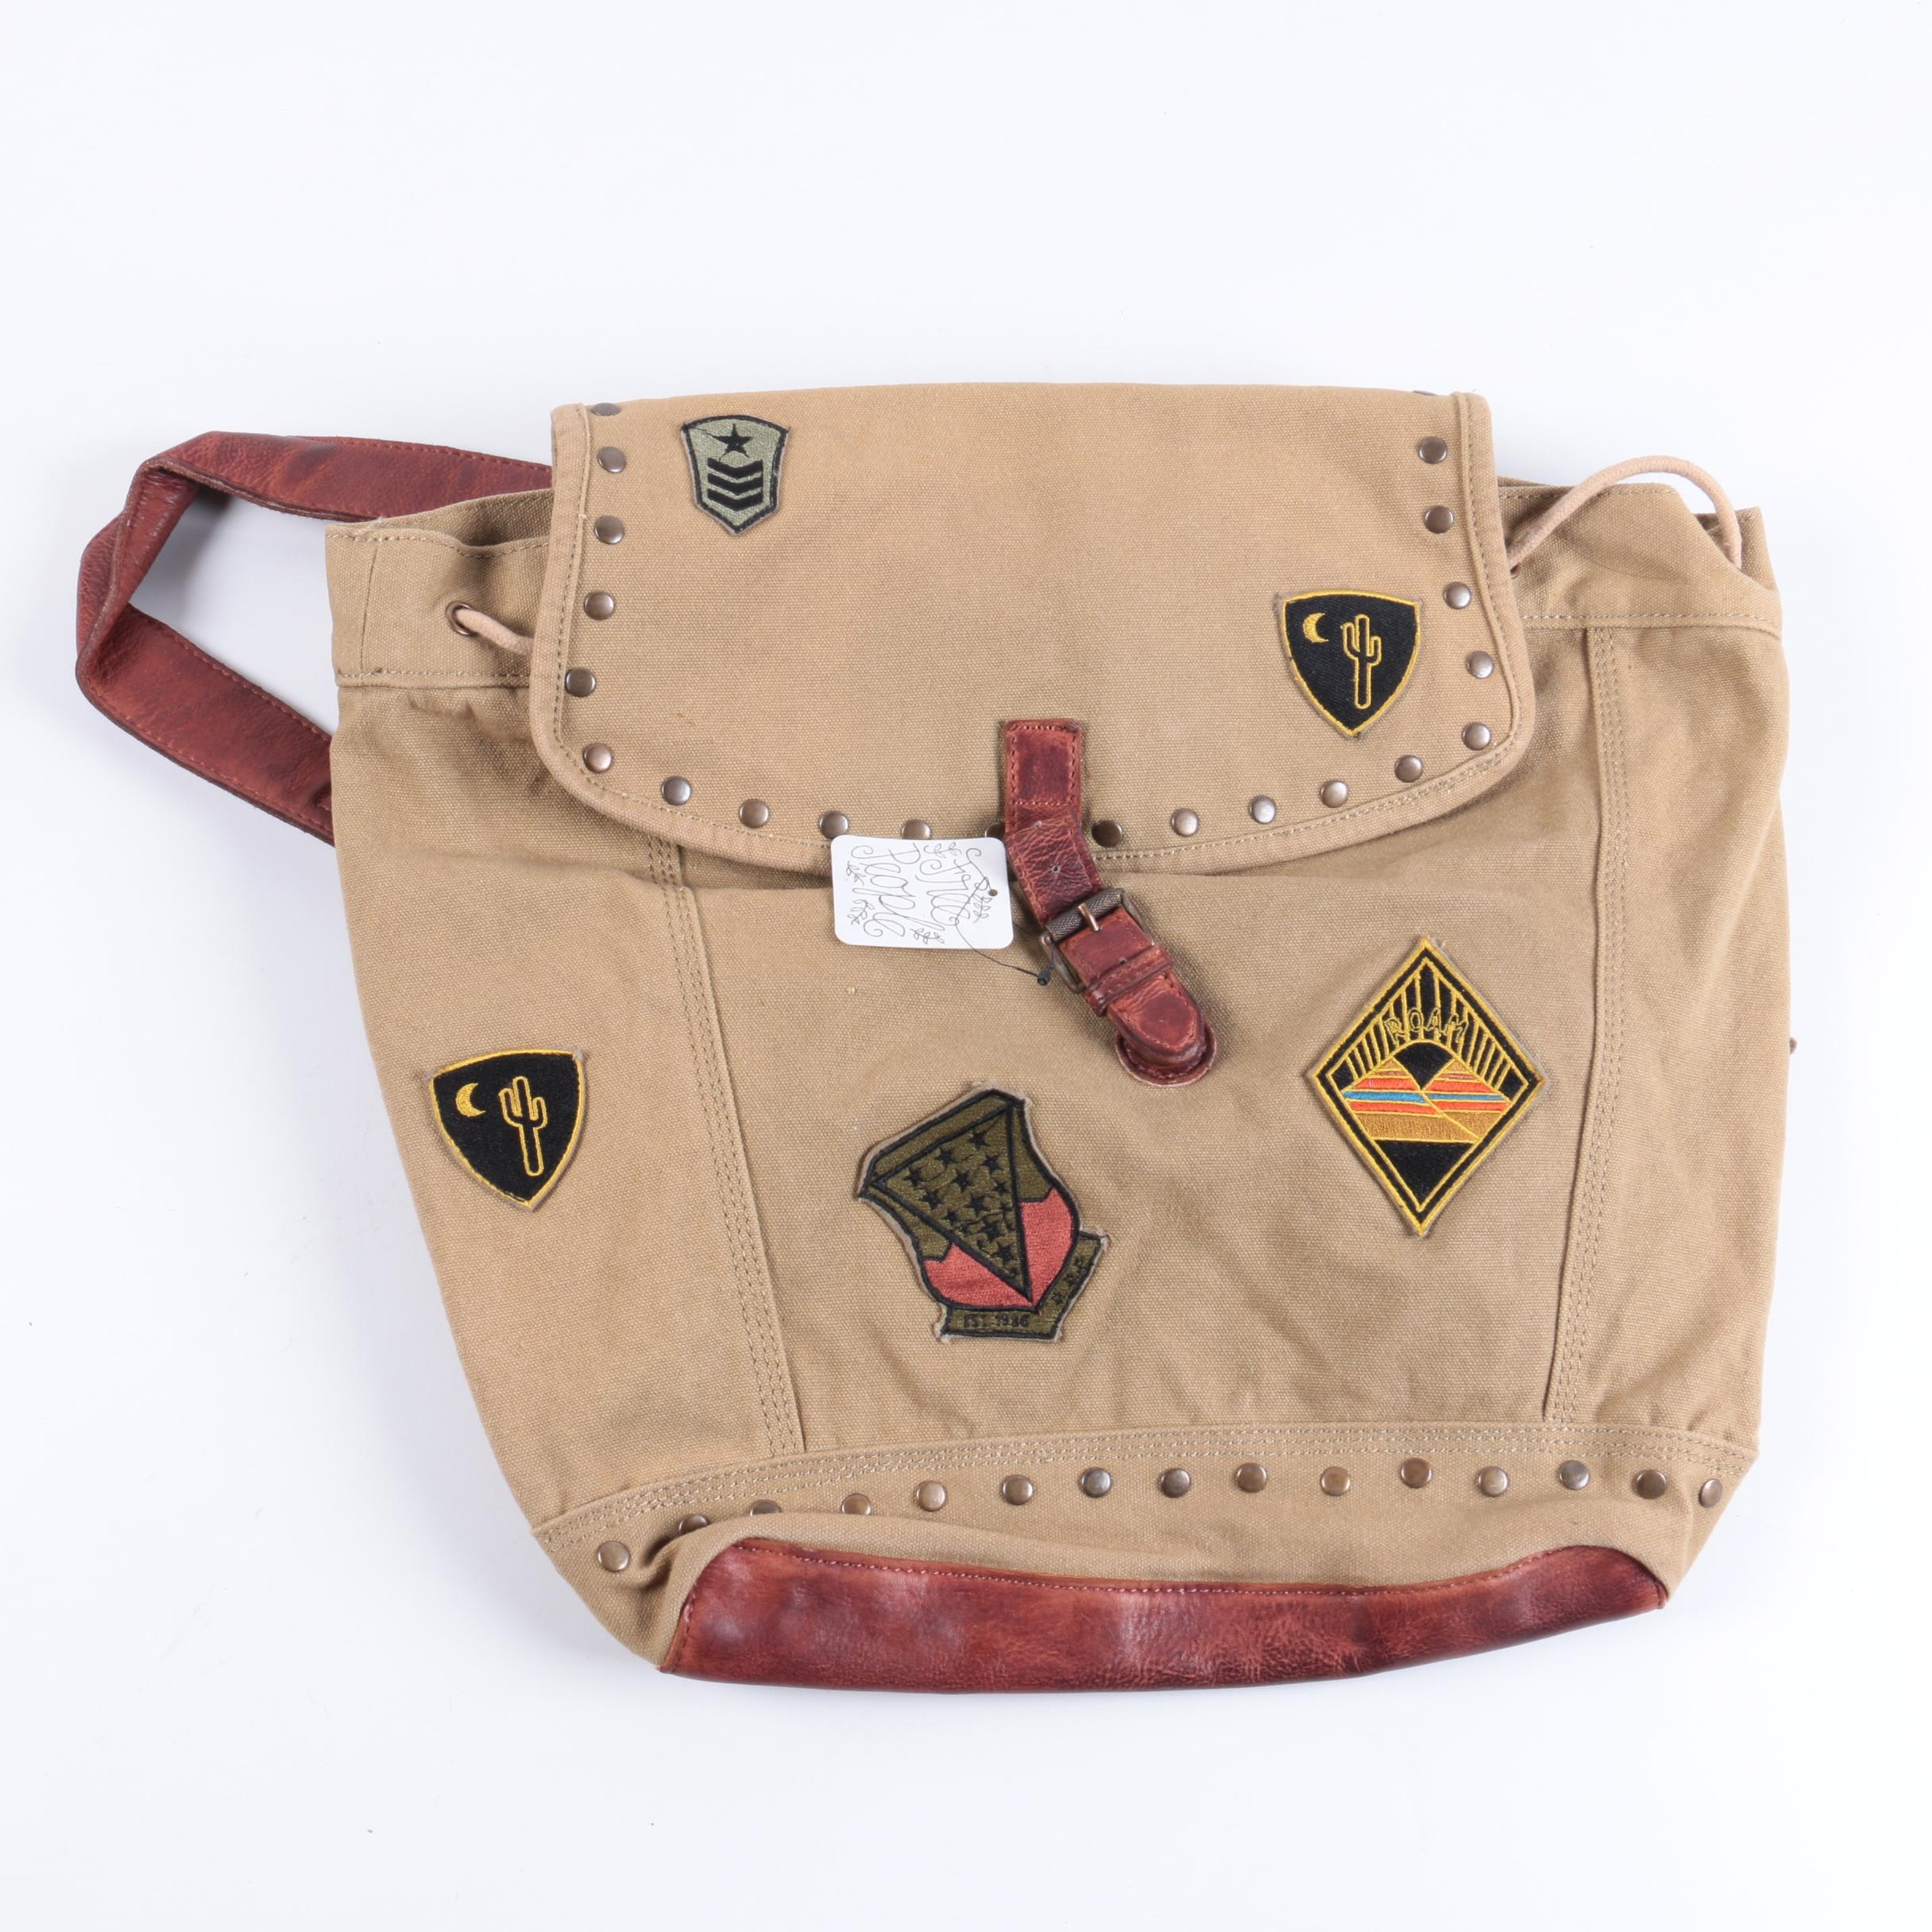 Free People Khaki Canvas Backpack